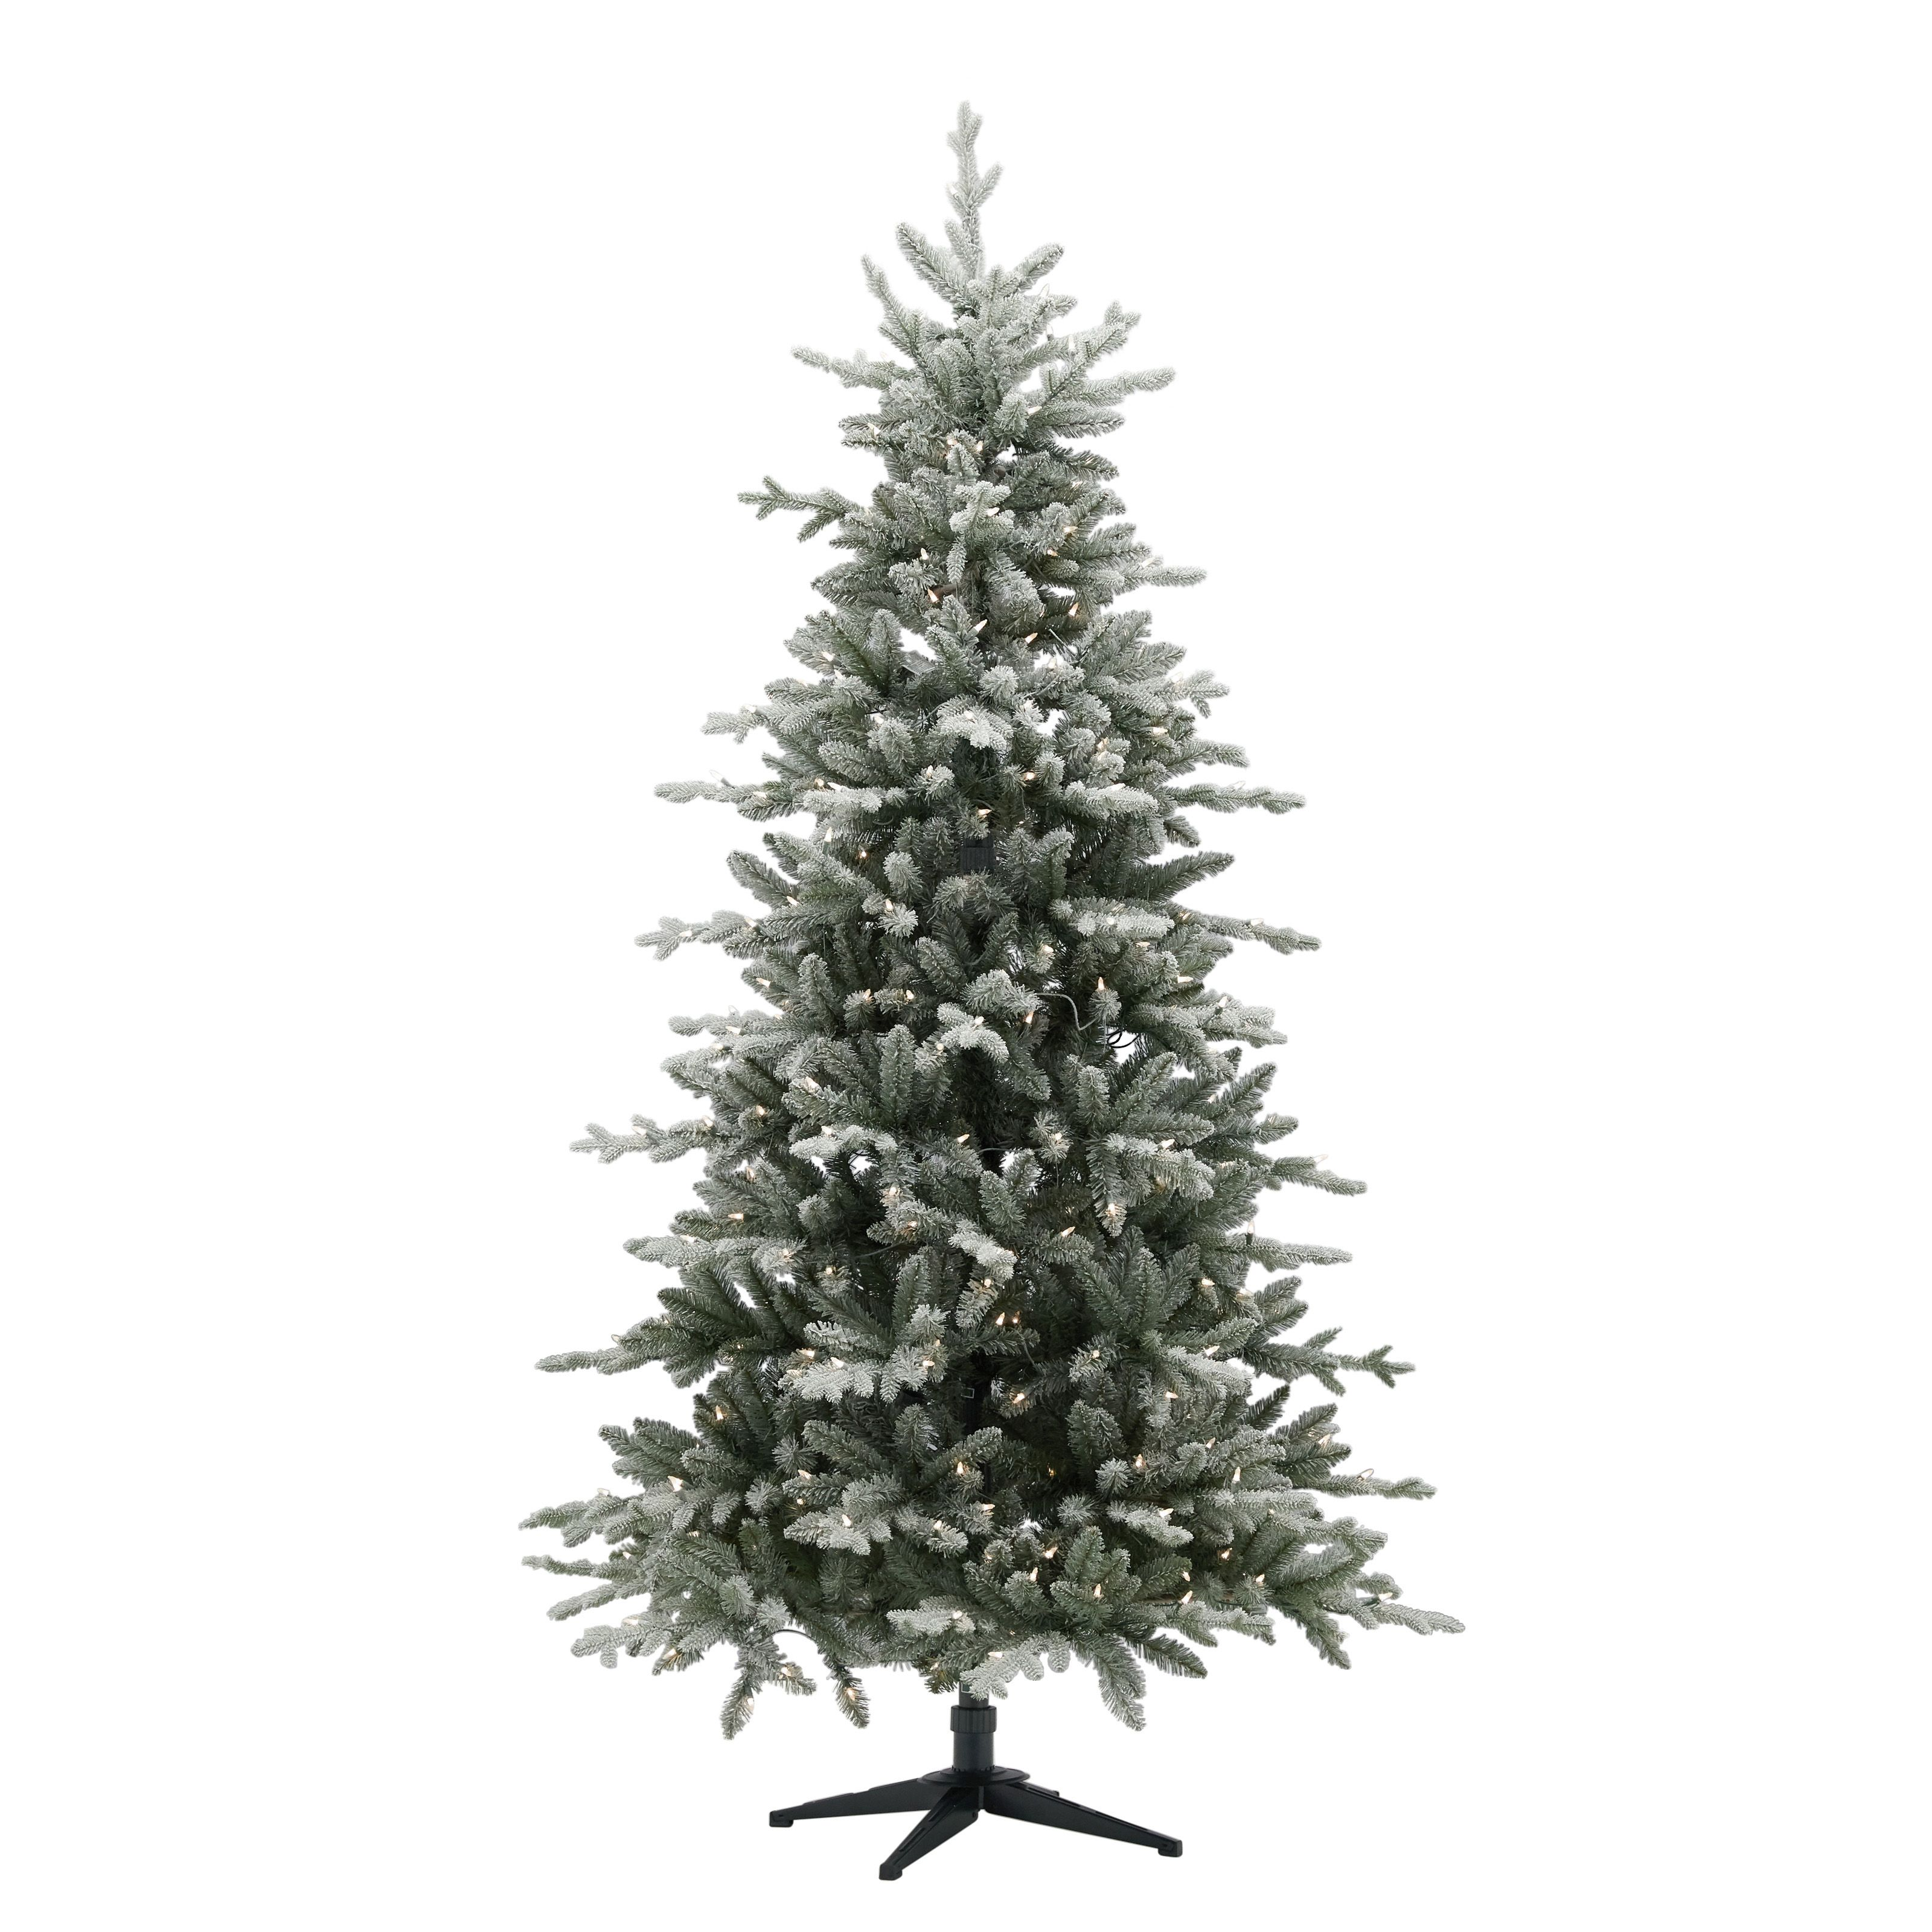 Belham Living Pre Lit Hamilton Flocked Quick Set Pine Artificial Christmas Tree 7 Clear Incandescent Lights Walmart Com Artificial Christmas Tree Best Artificial Christmas Trees Incandescent Lights